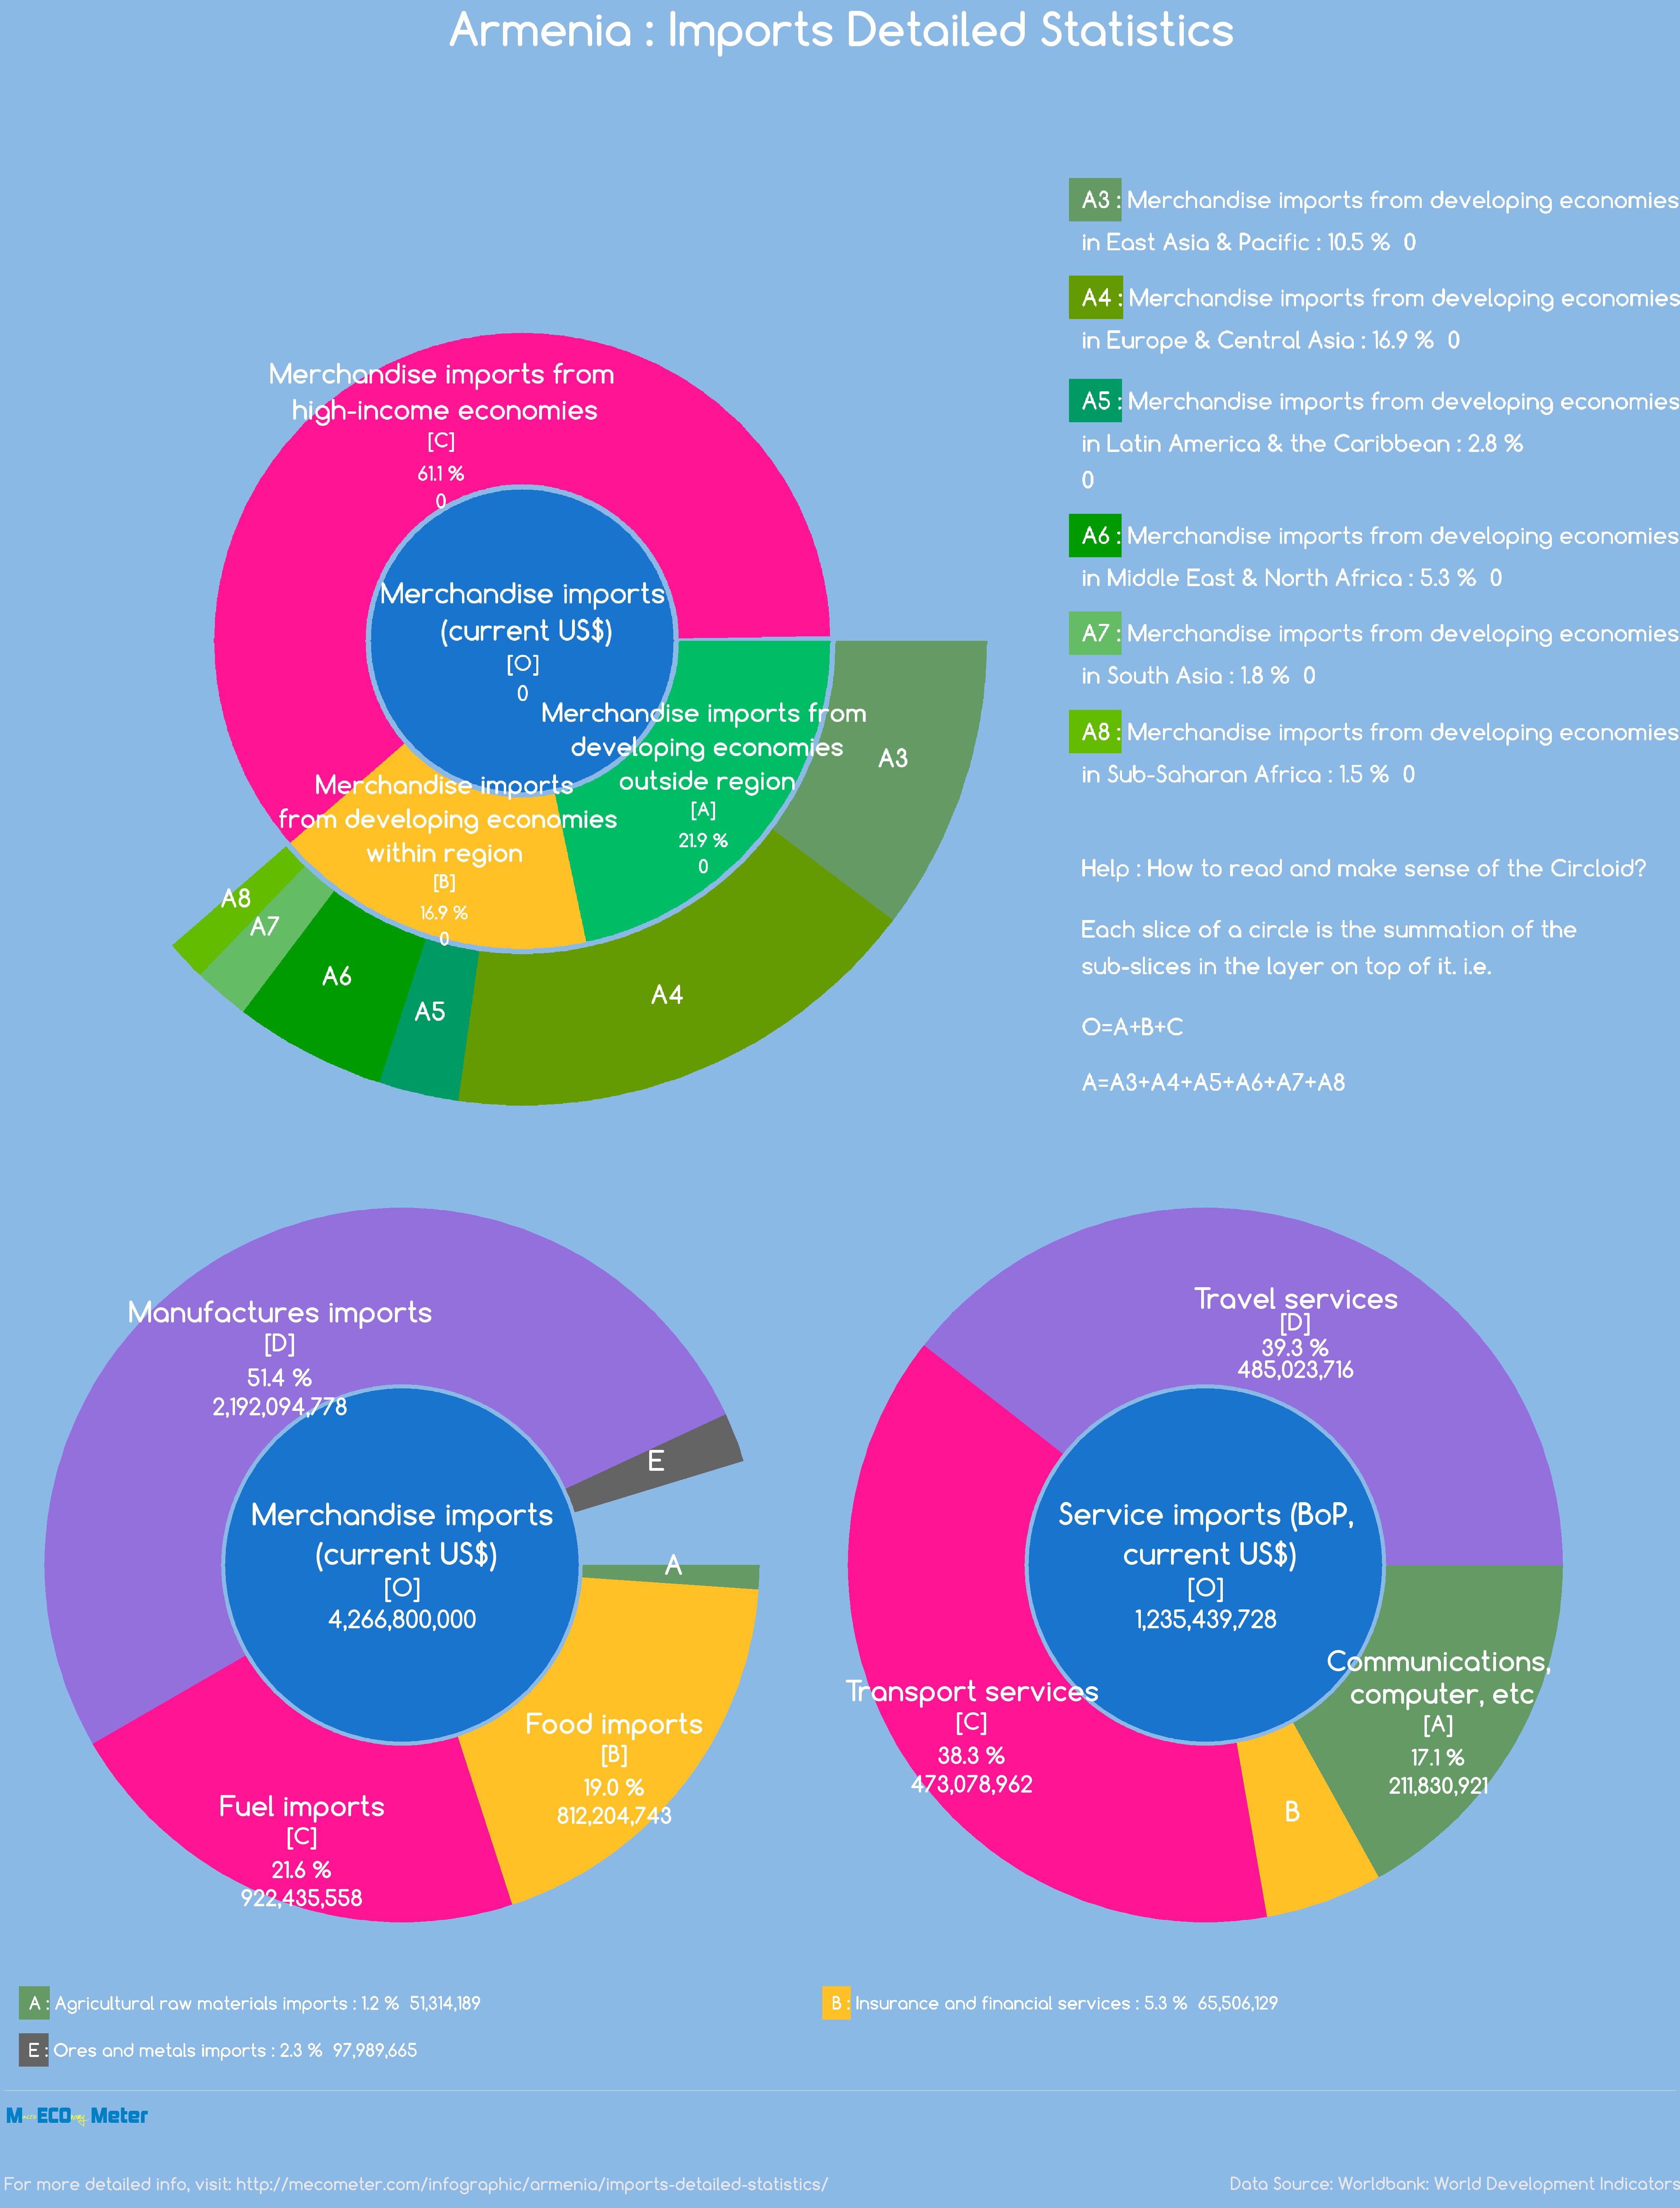 Armenia : Imports Detailed Statistics